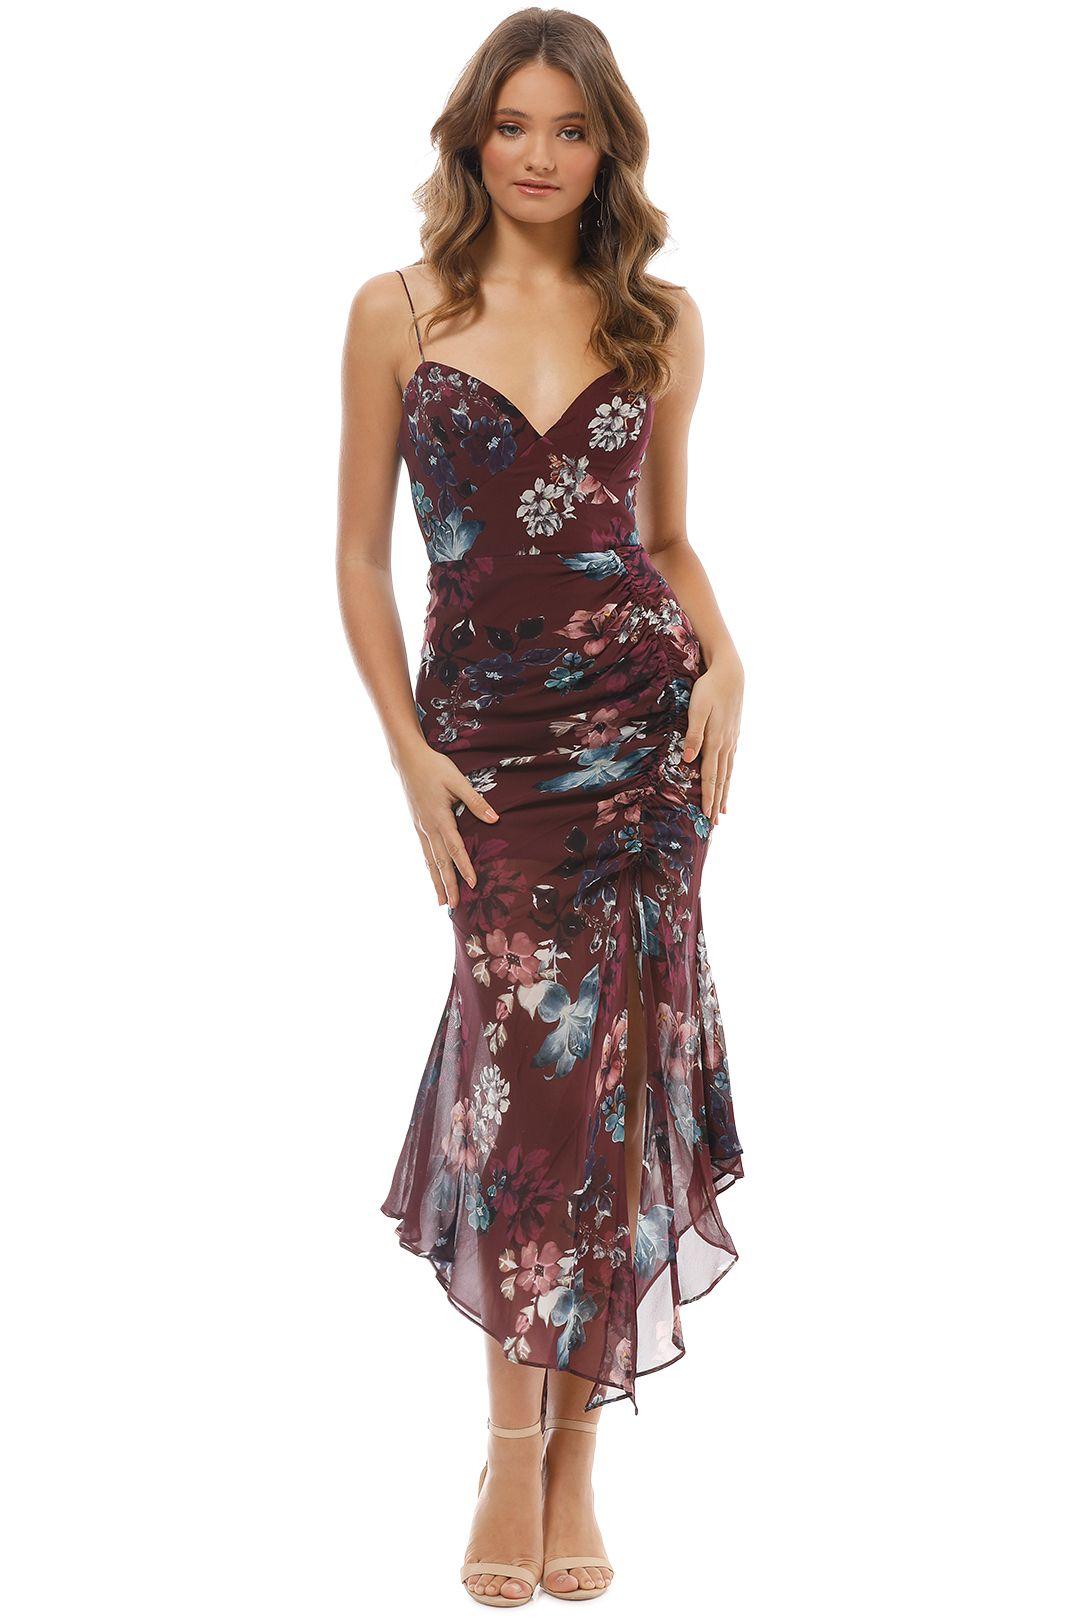 Nicholas The Label - Burgundy Floral Drawstring Dress - Burgundy - Front